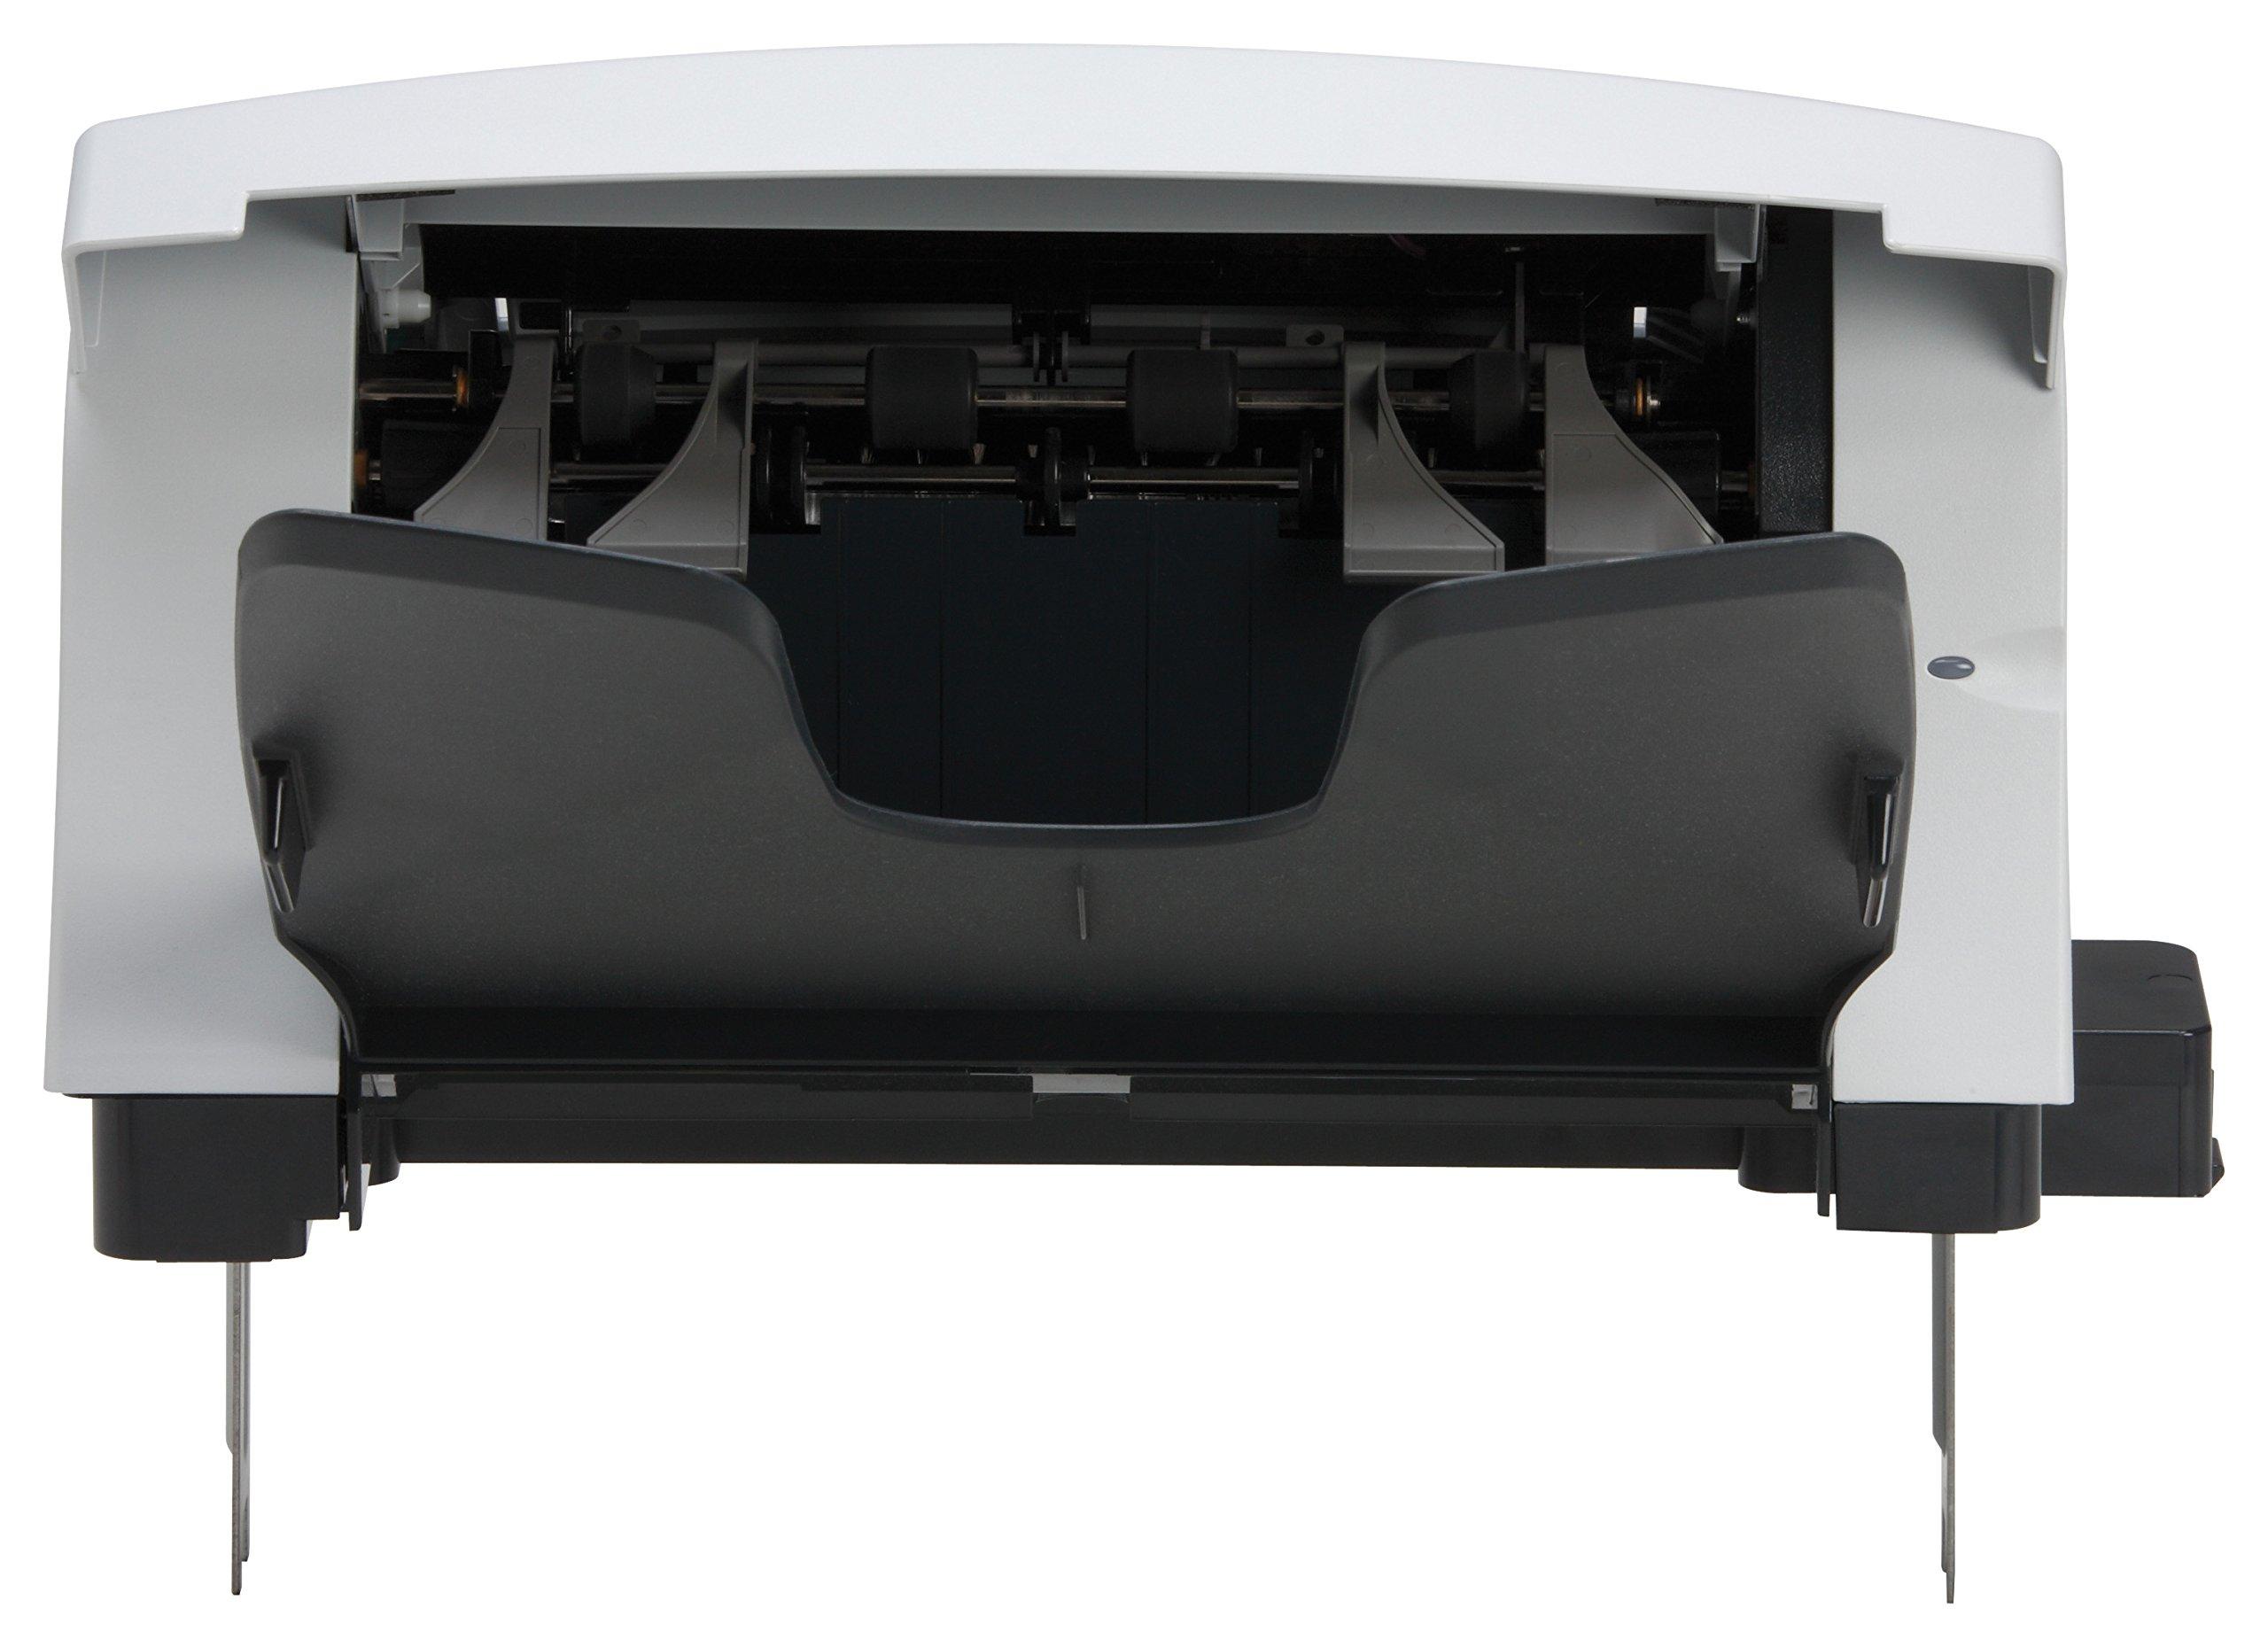 HP Q2442B Sheet Stacker for Laserjet 4250, 4350